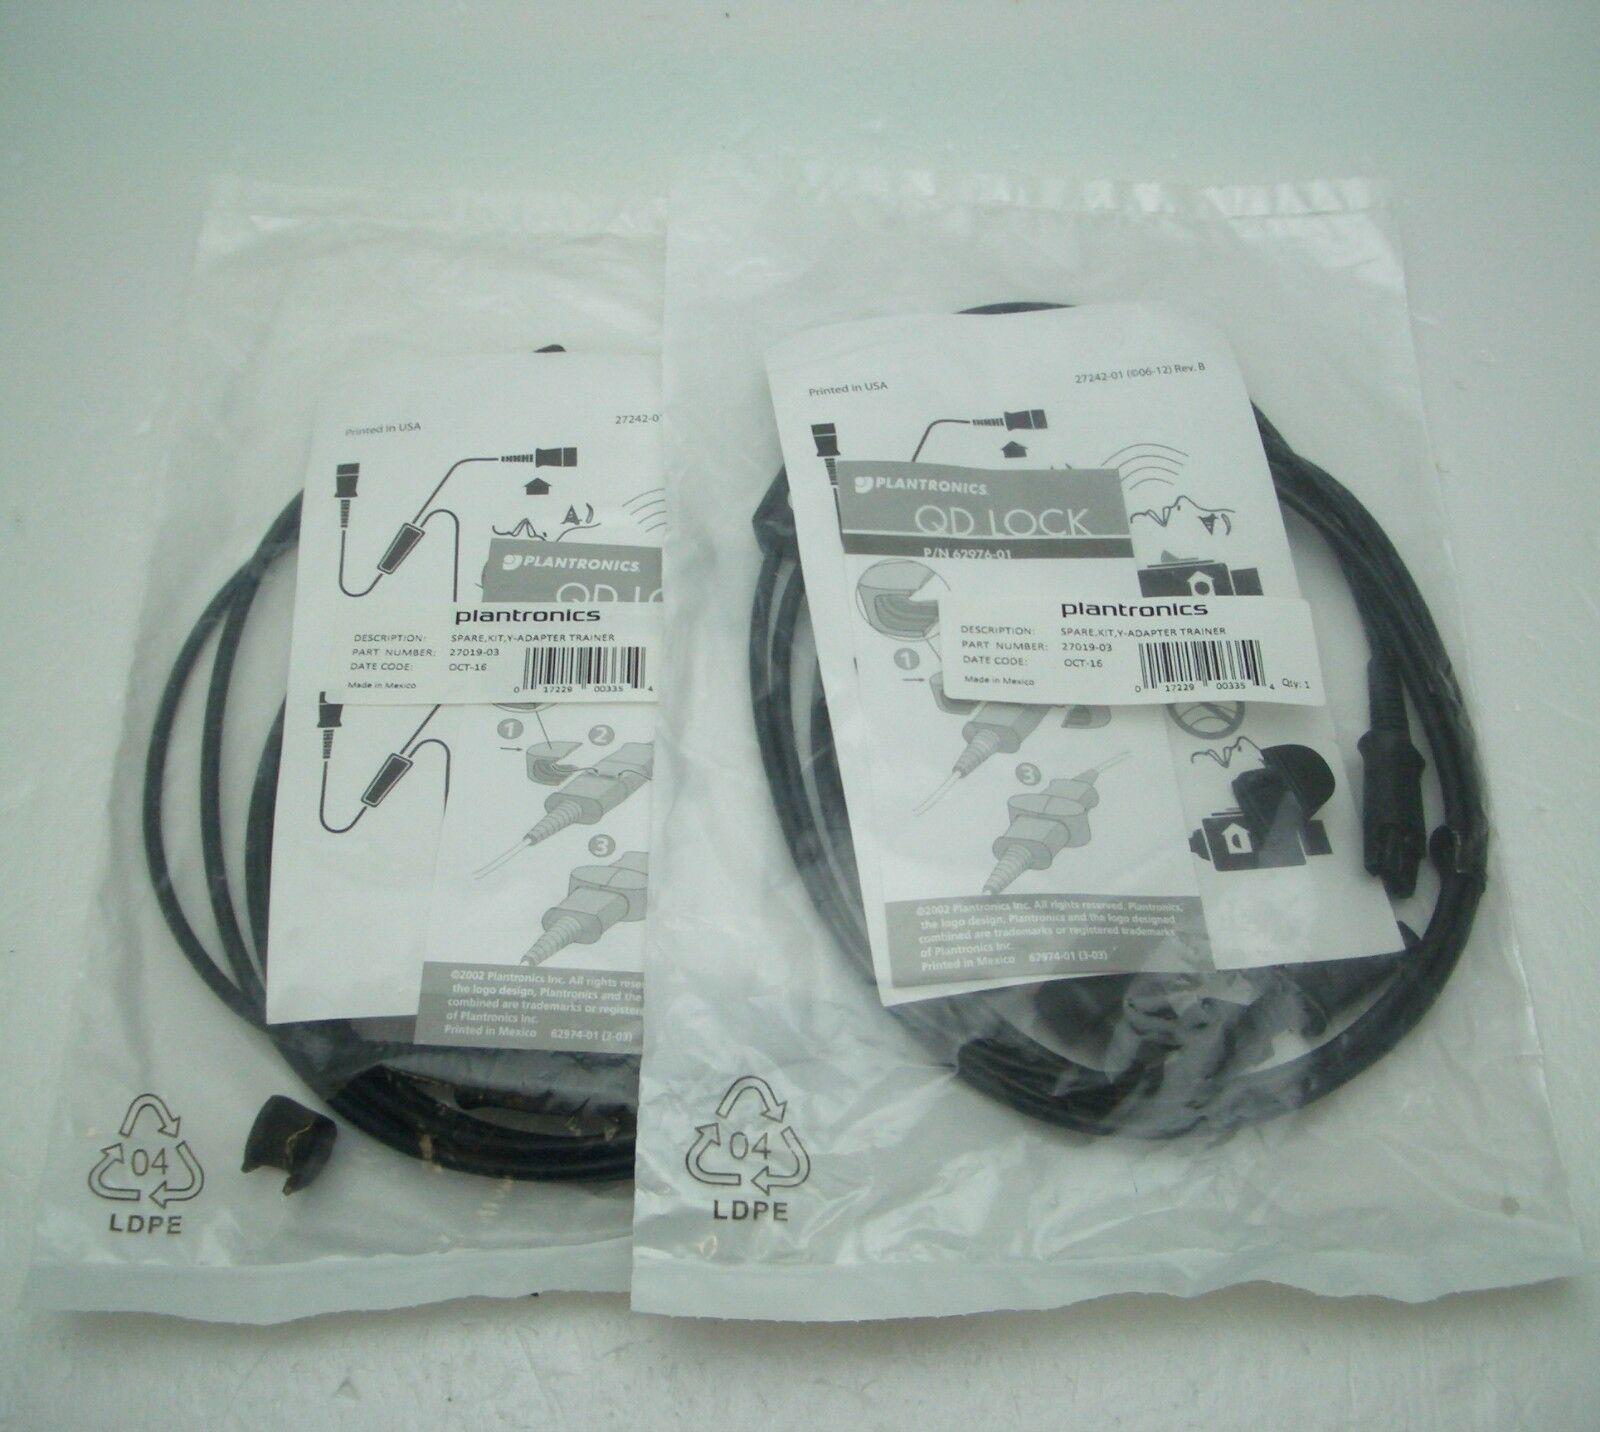 2 X Plantronics Y Training Supervisor Qd Splitter Cable